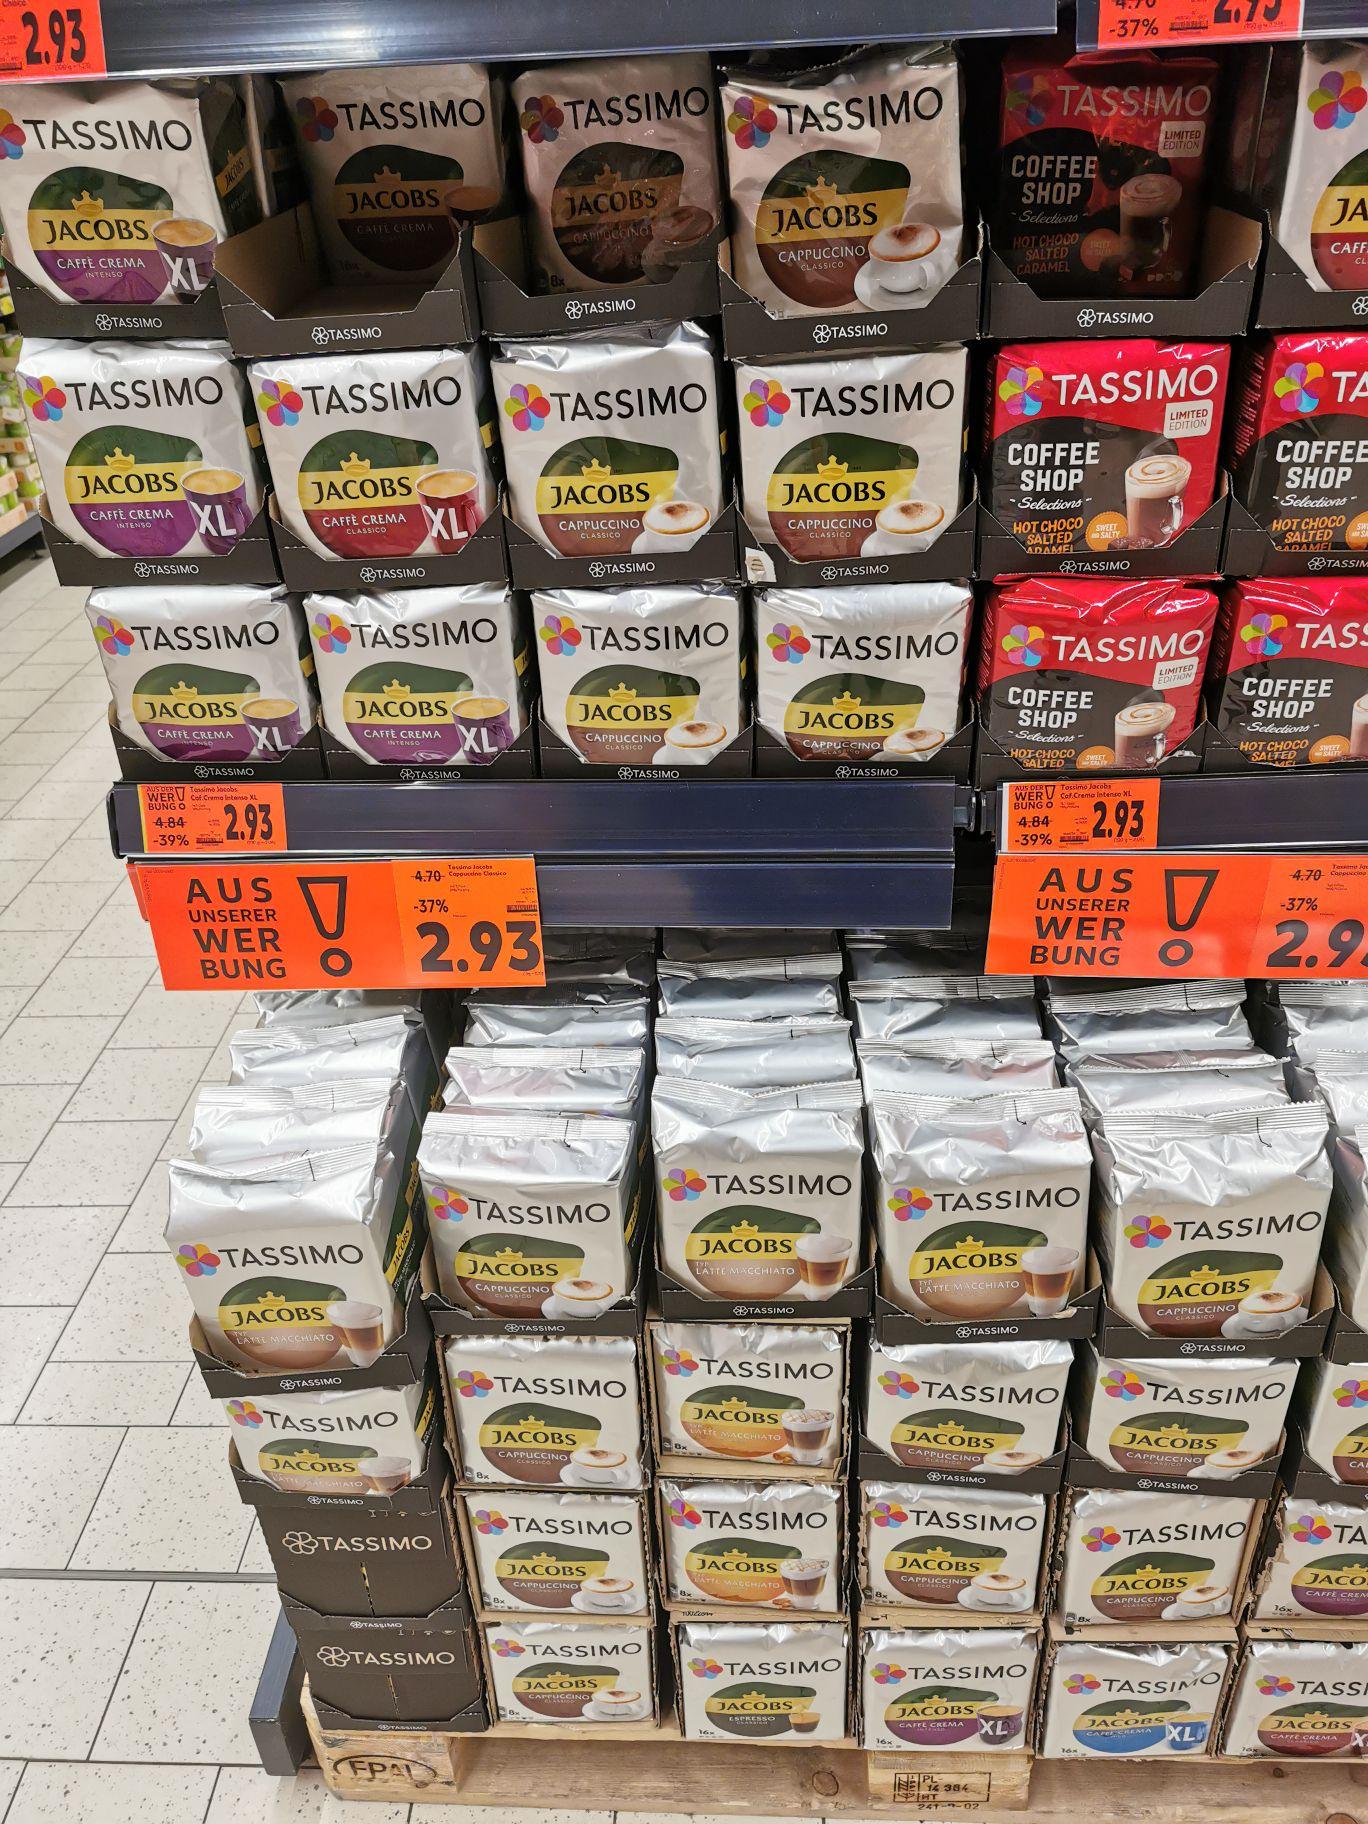 Tassimo Kaffeekapseln, alle Sorten - Preiskracher [Kaufland bundesweit]